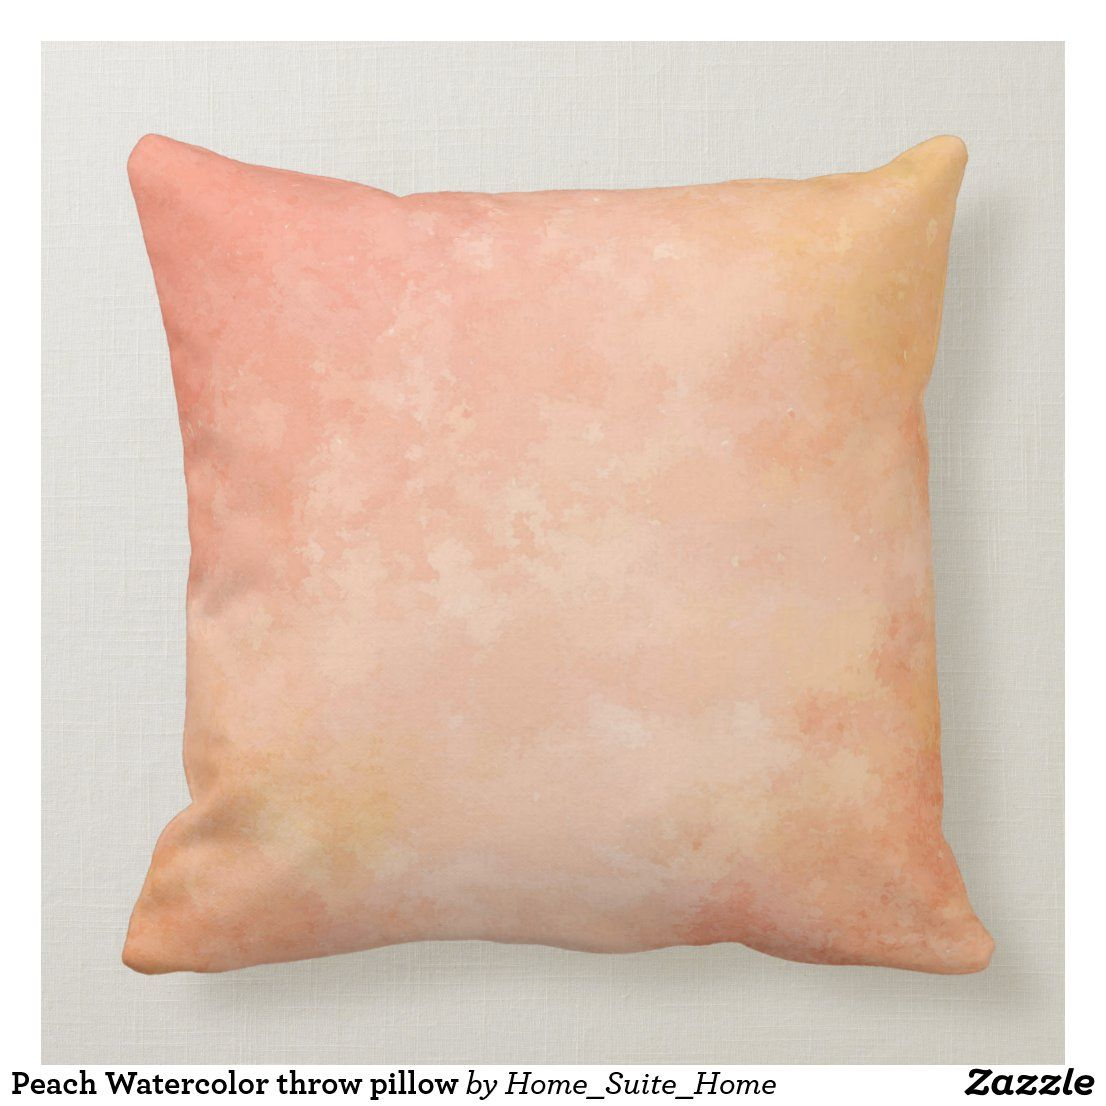 Peach Watercolor throw pillow | Zazzle